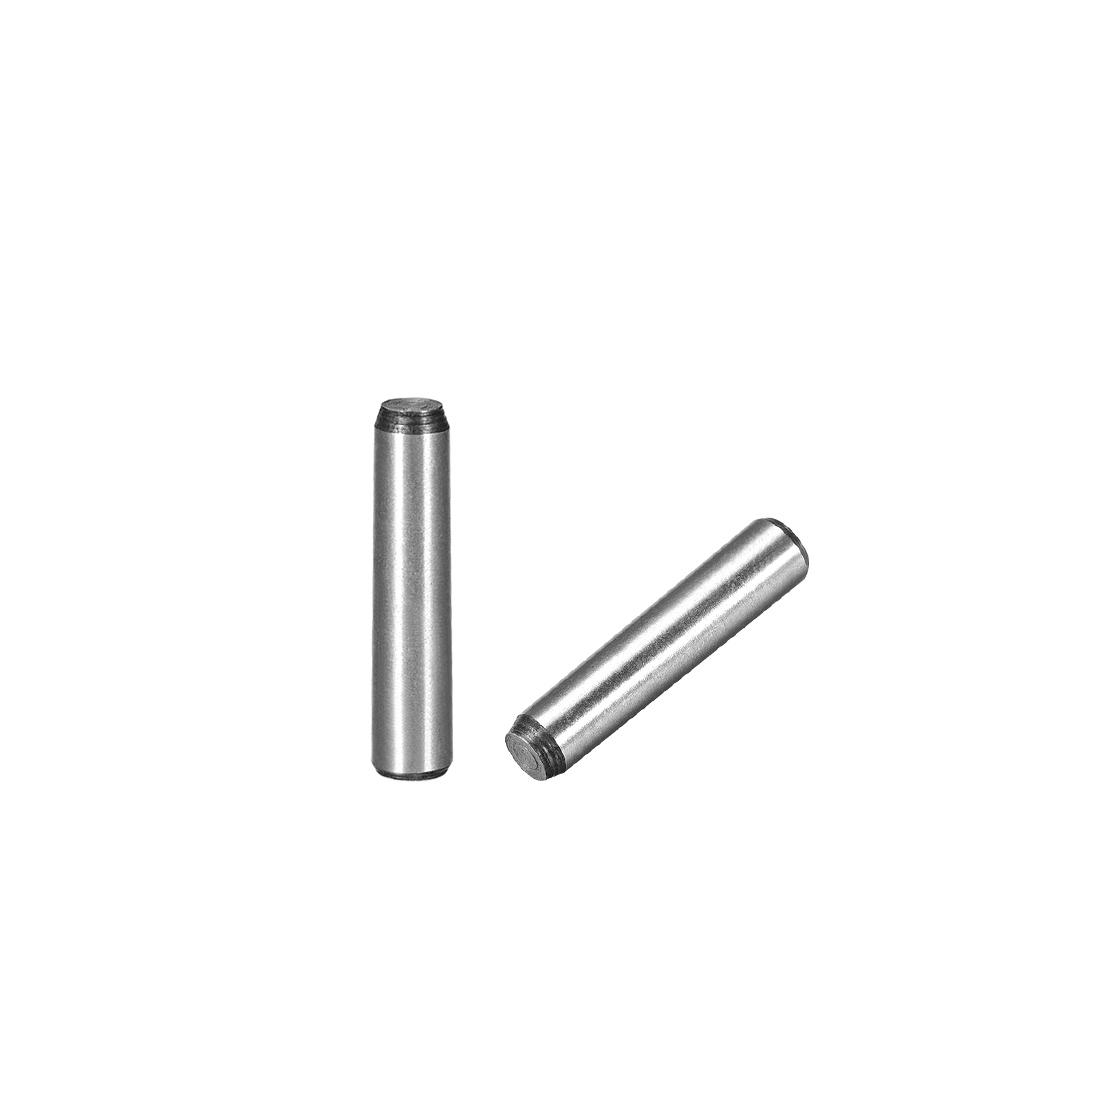 45# Carbon Steel GB117 30mm Length 6mm Small End Diameter 1:50 Taper Pin 10Pcs